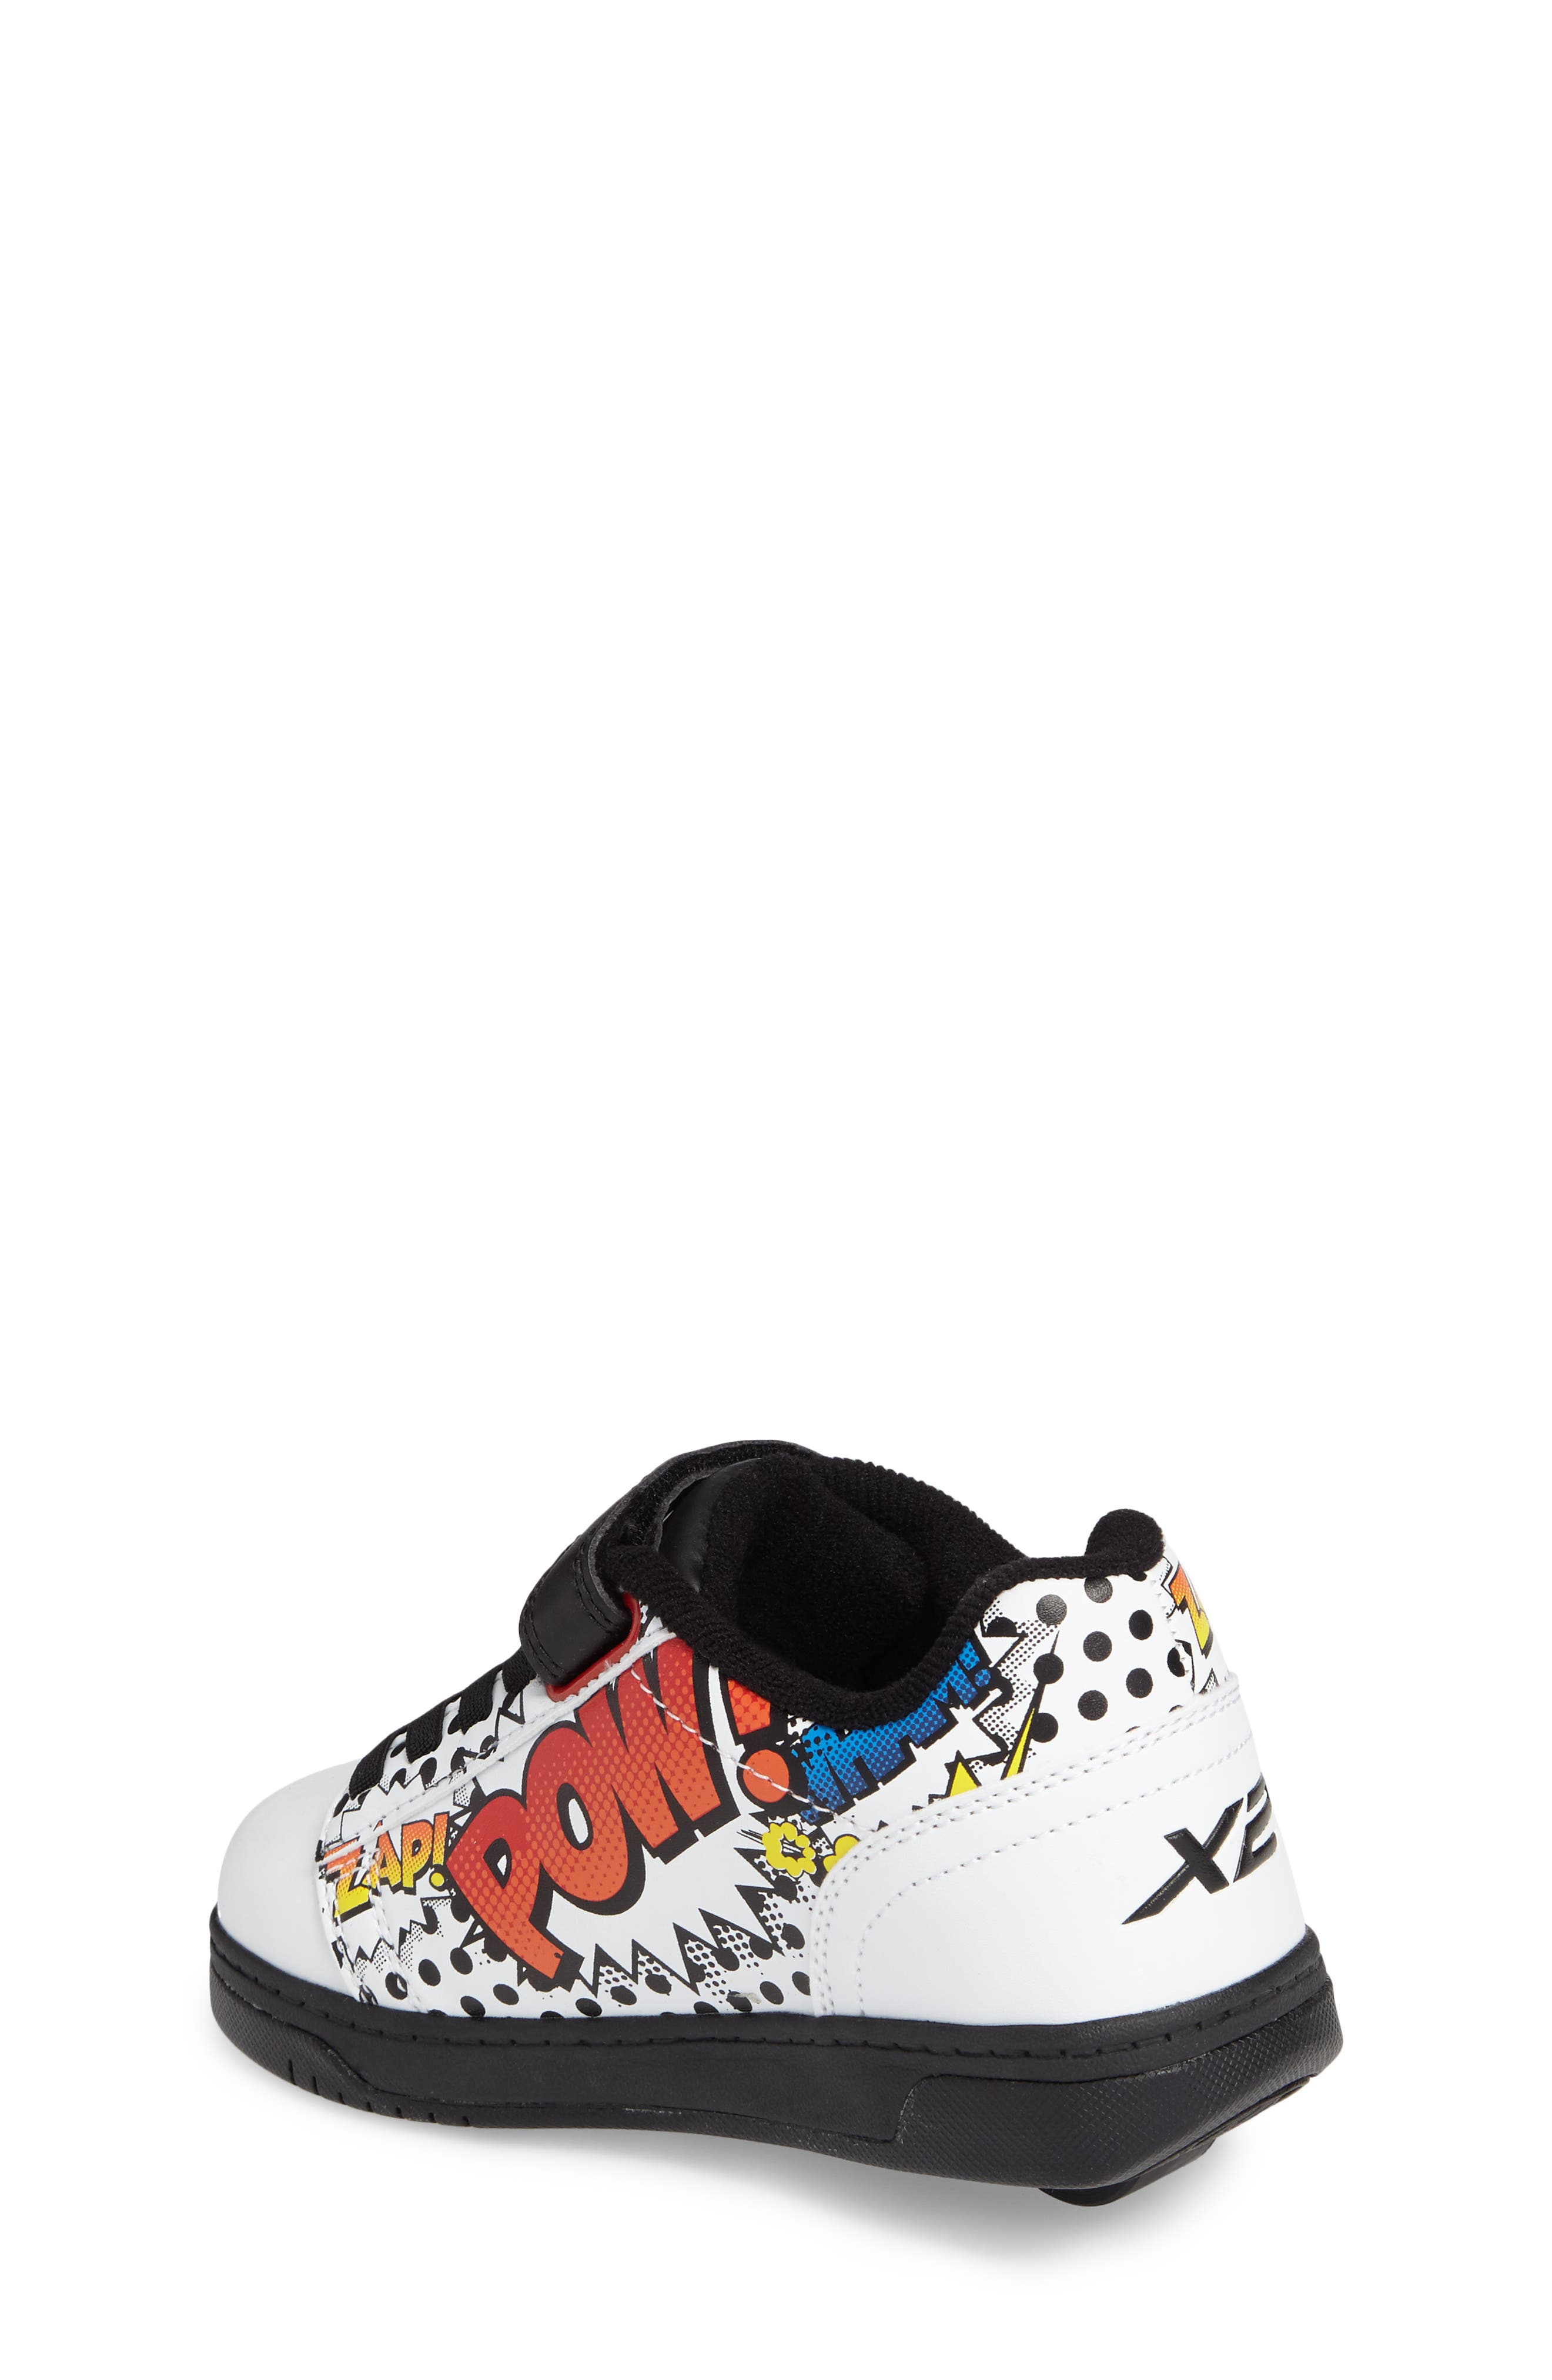 Alternate Image 2  - Heelys Dual Up X2 Comic Sneaker (Toddler, Little Kid & Big Kid)